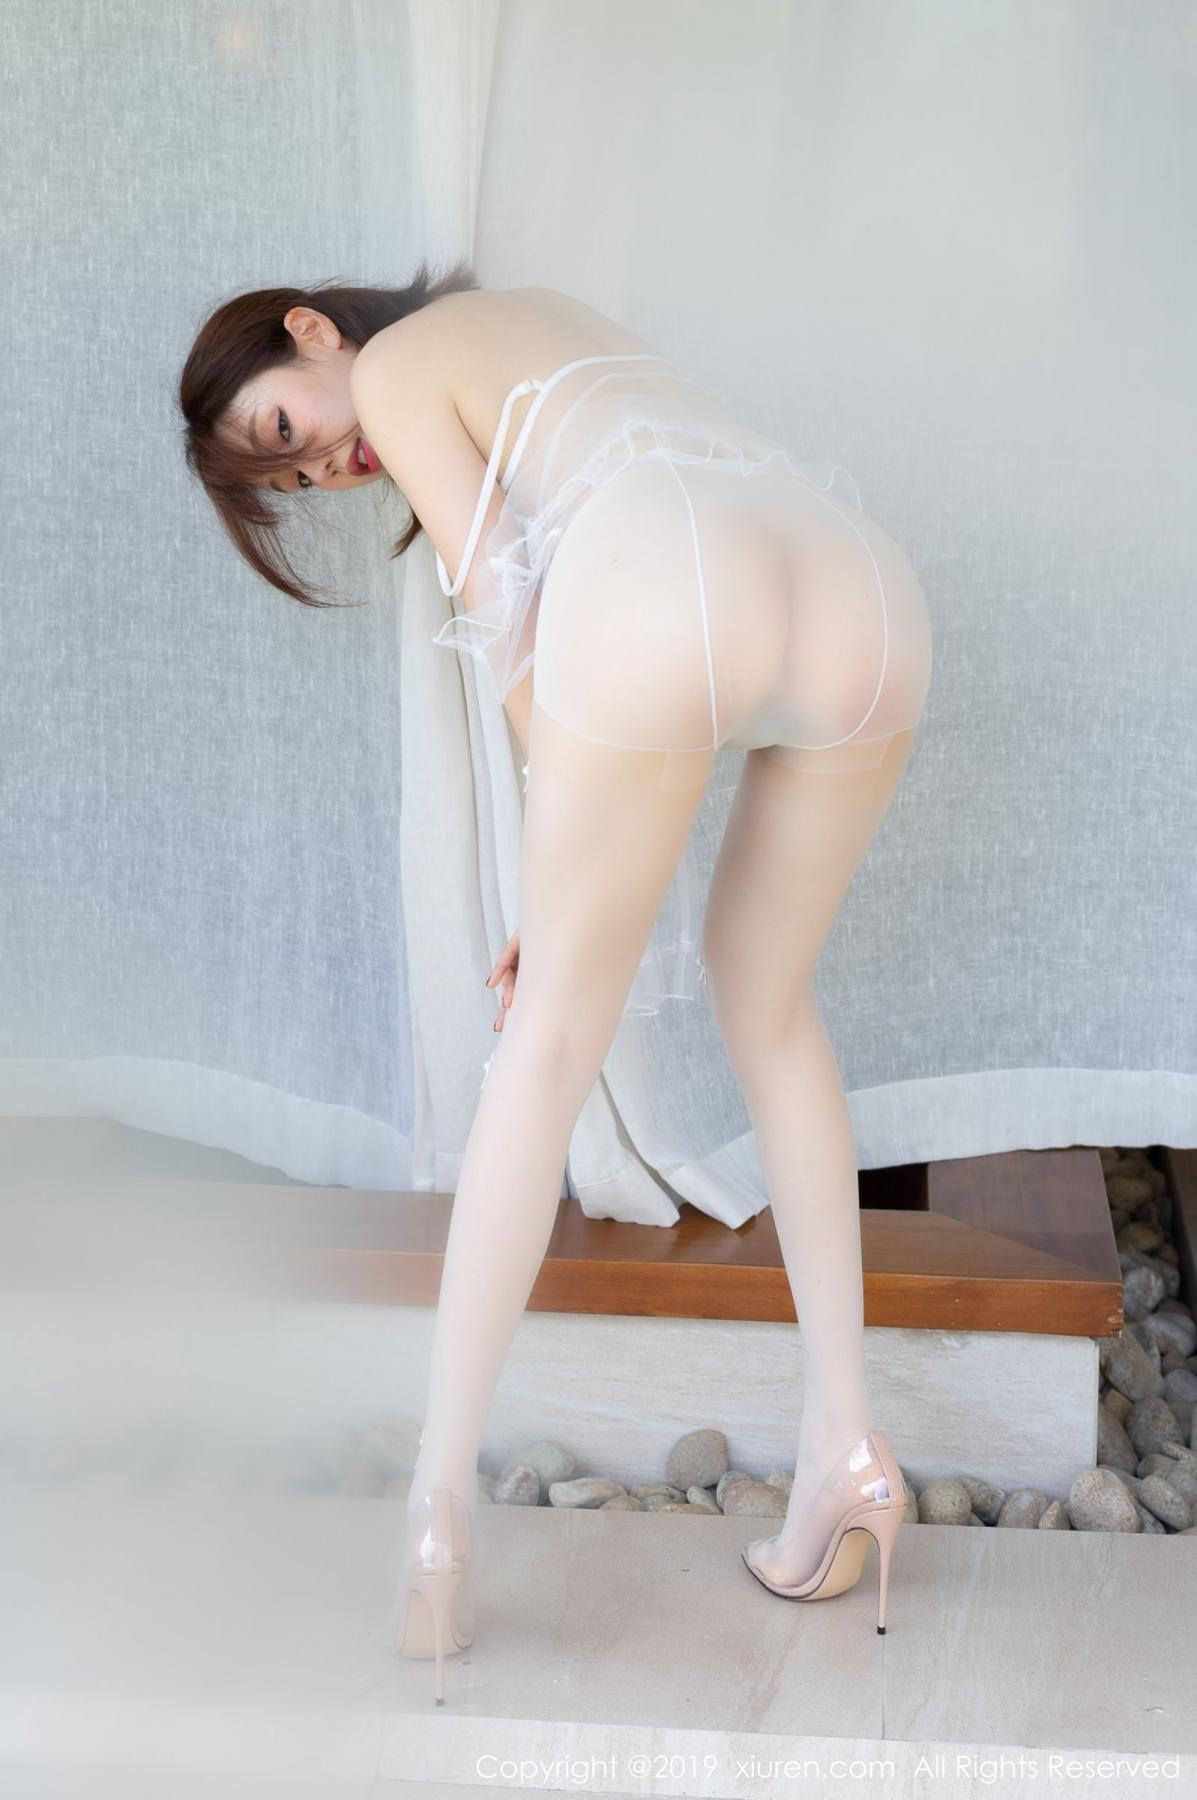 [XiuRen] Vol.1578 Huang Le Ran 36P, Huang Le Ran, Underwear, Xiuren